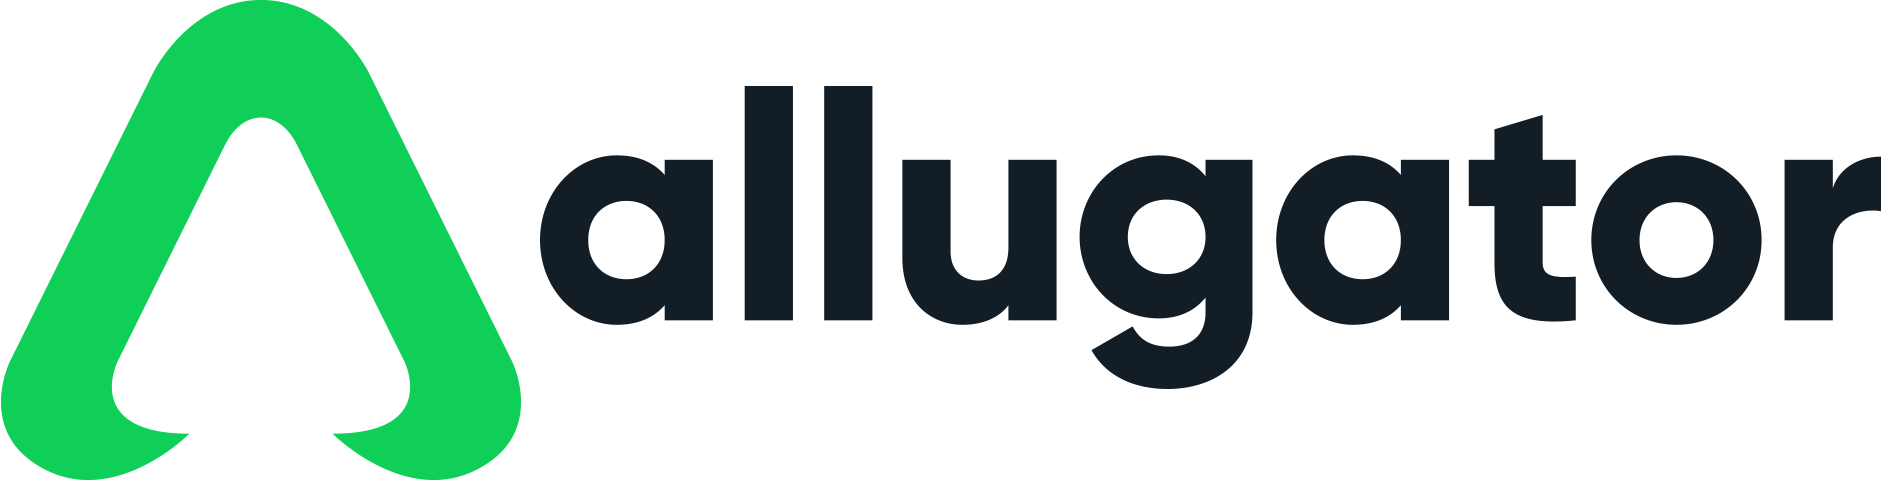 logo allugator